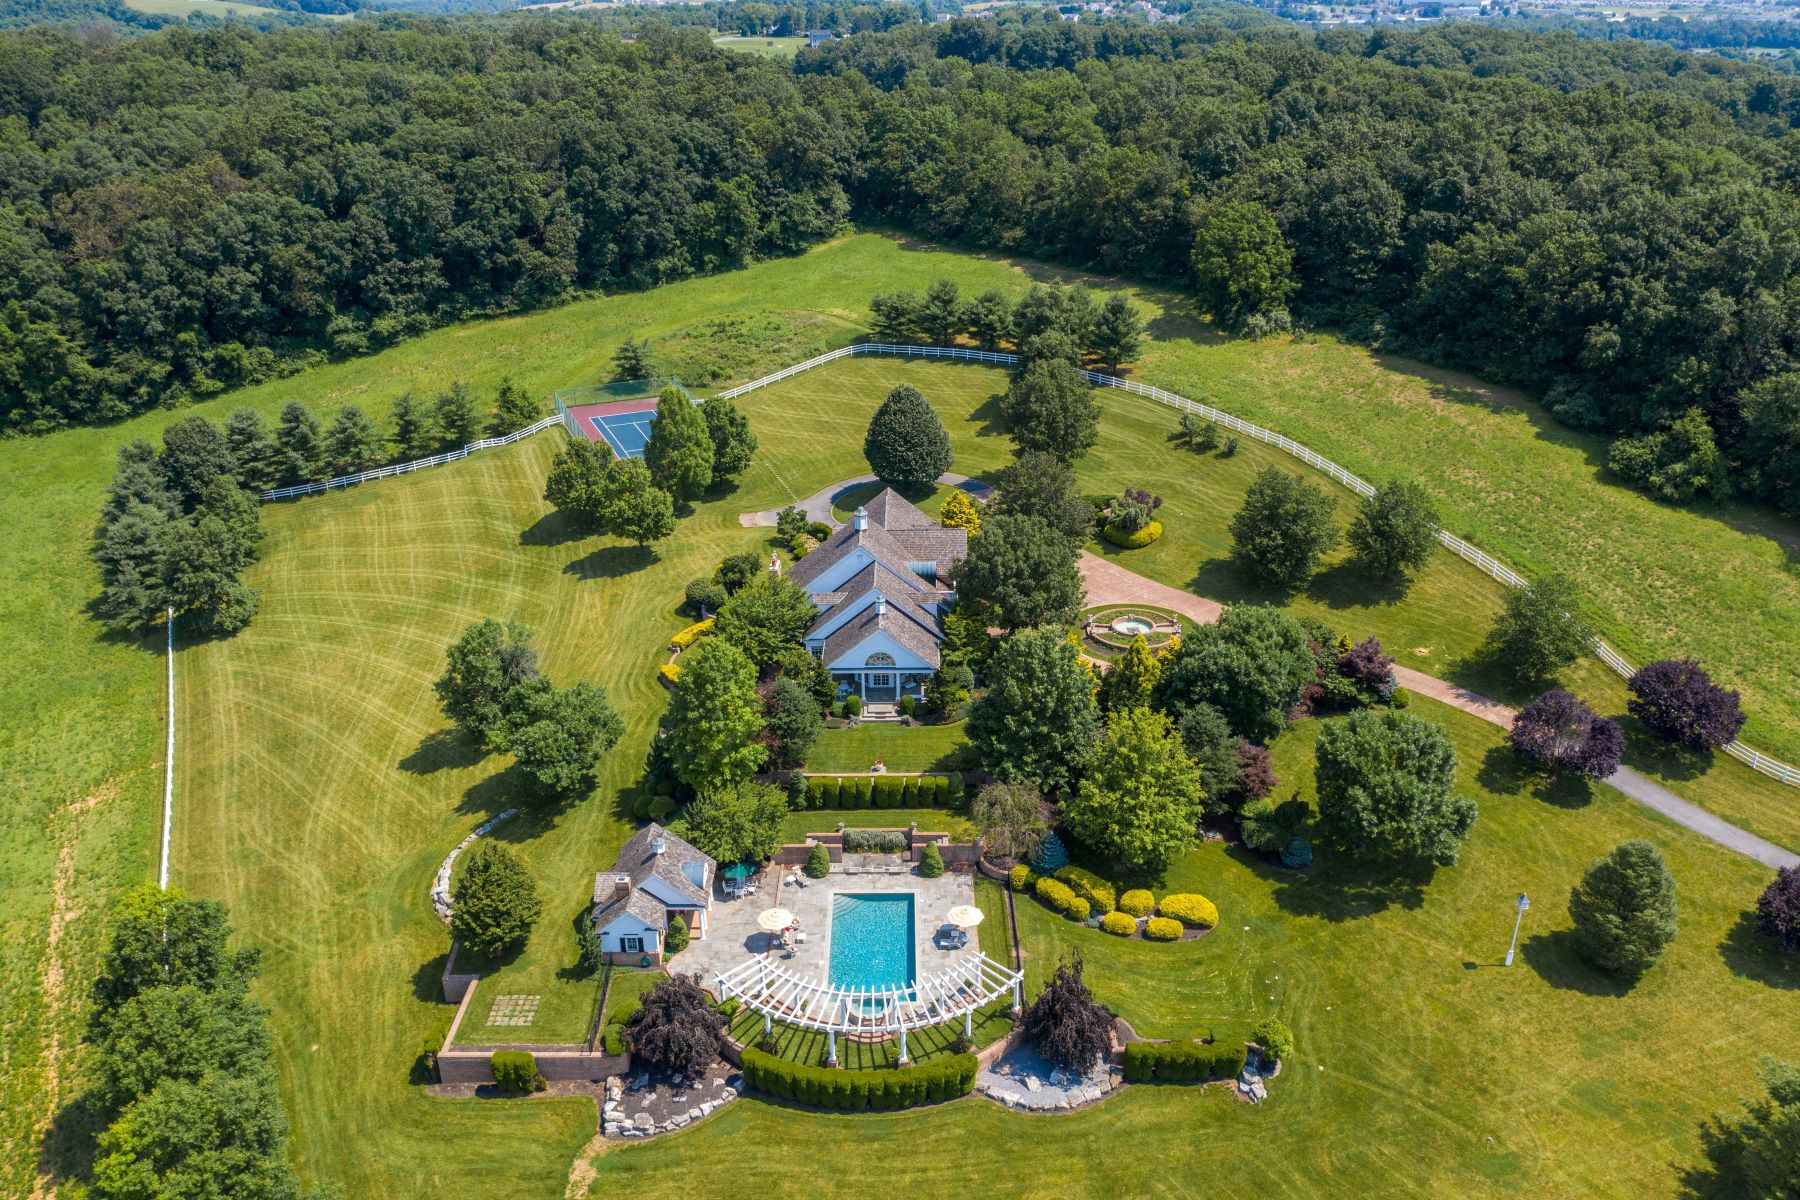 Single Family Homes for Sale at 1081 Grange Road, Bern Twp Leesport, Pennsylvania 19533 United States